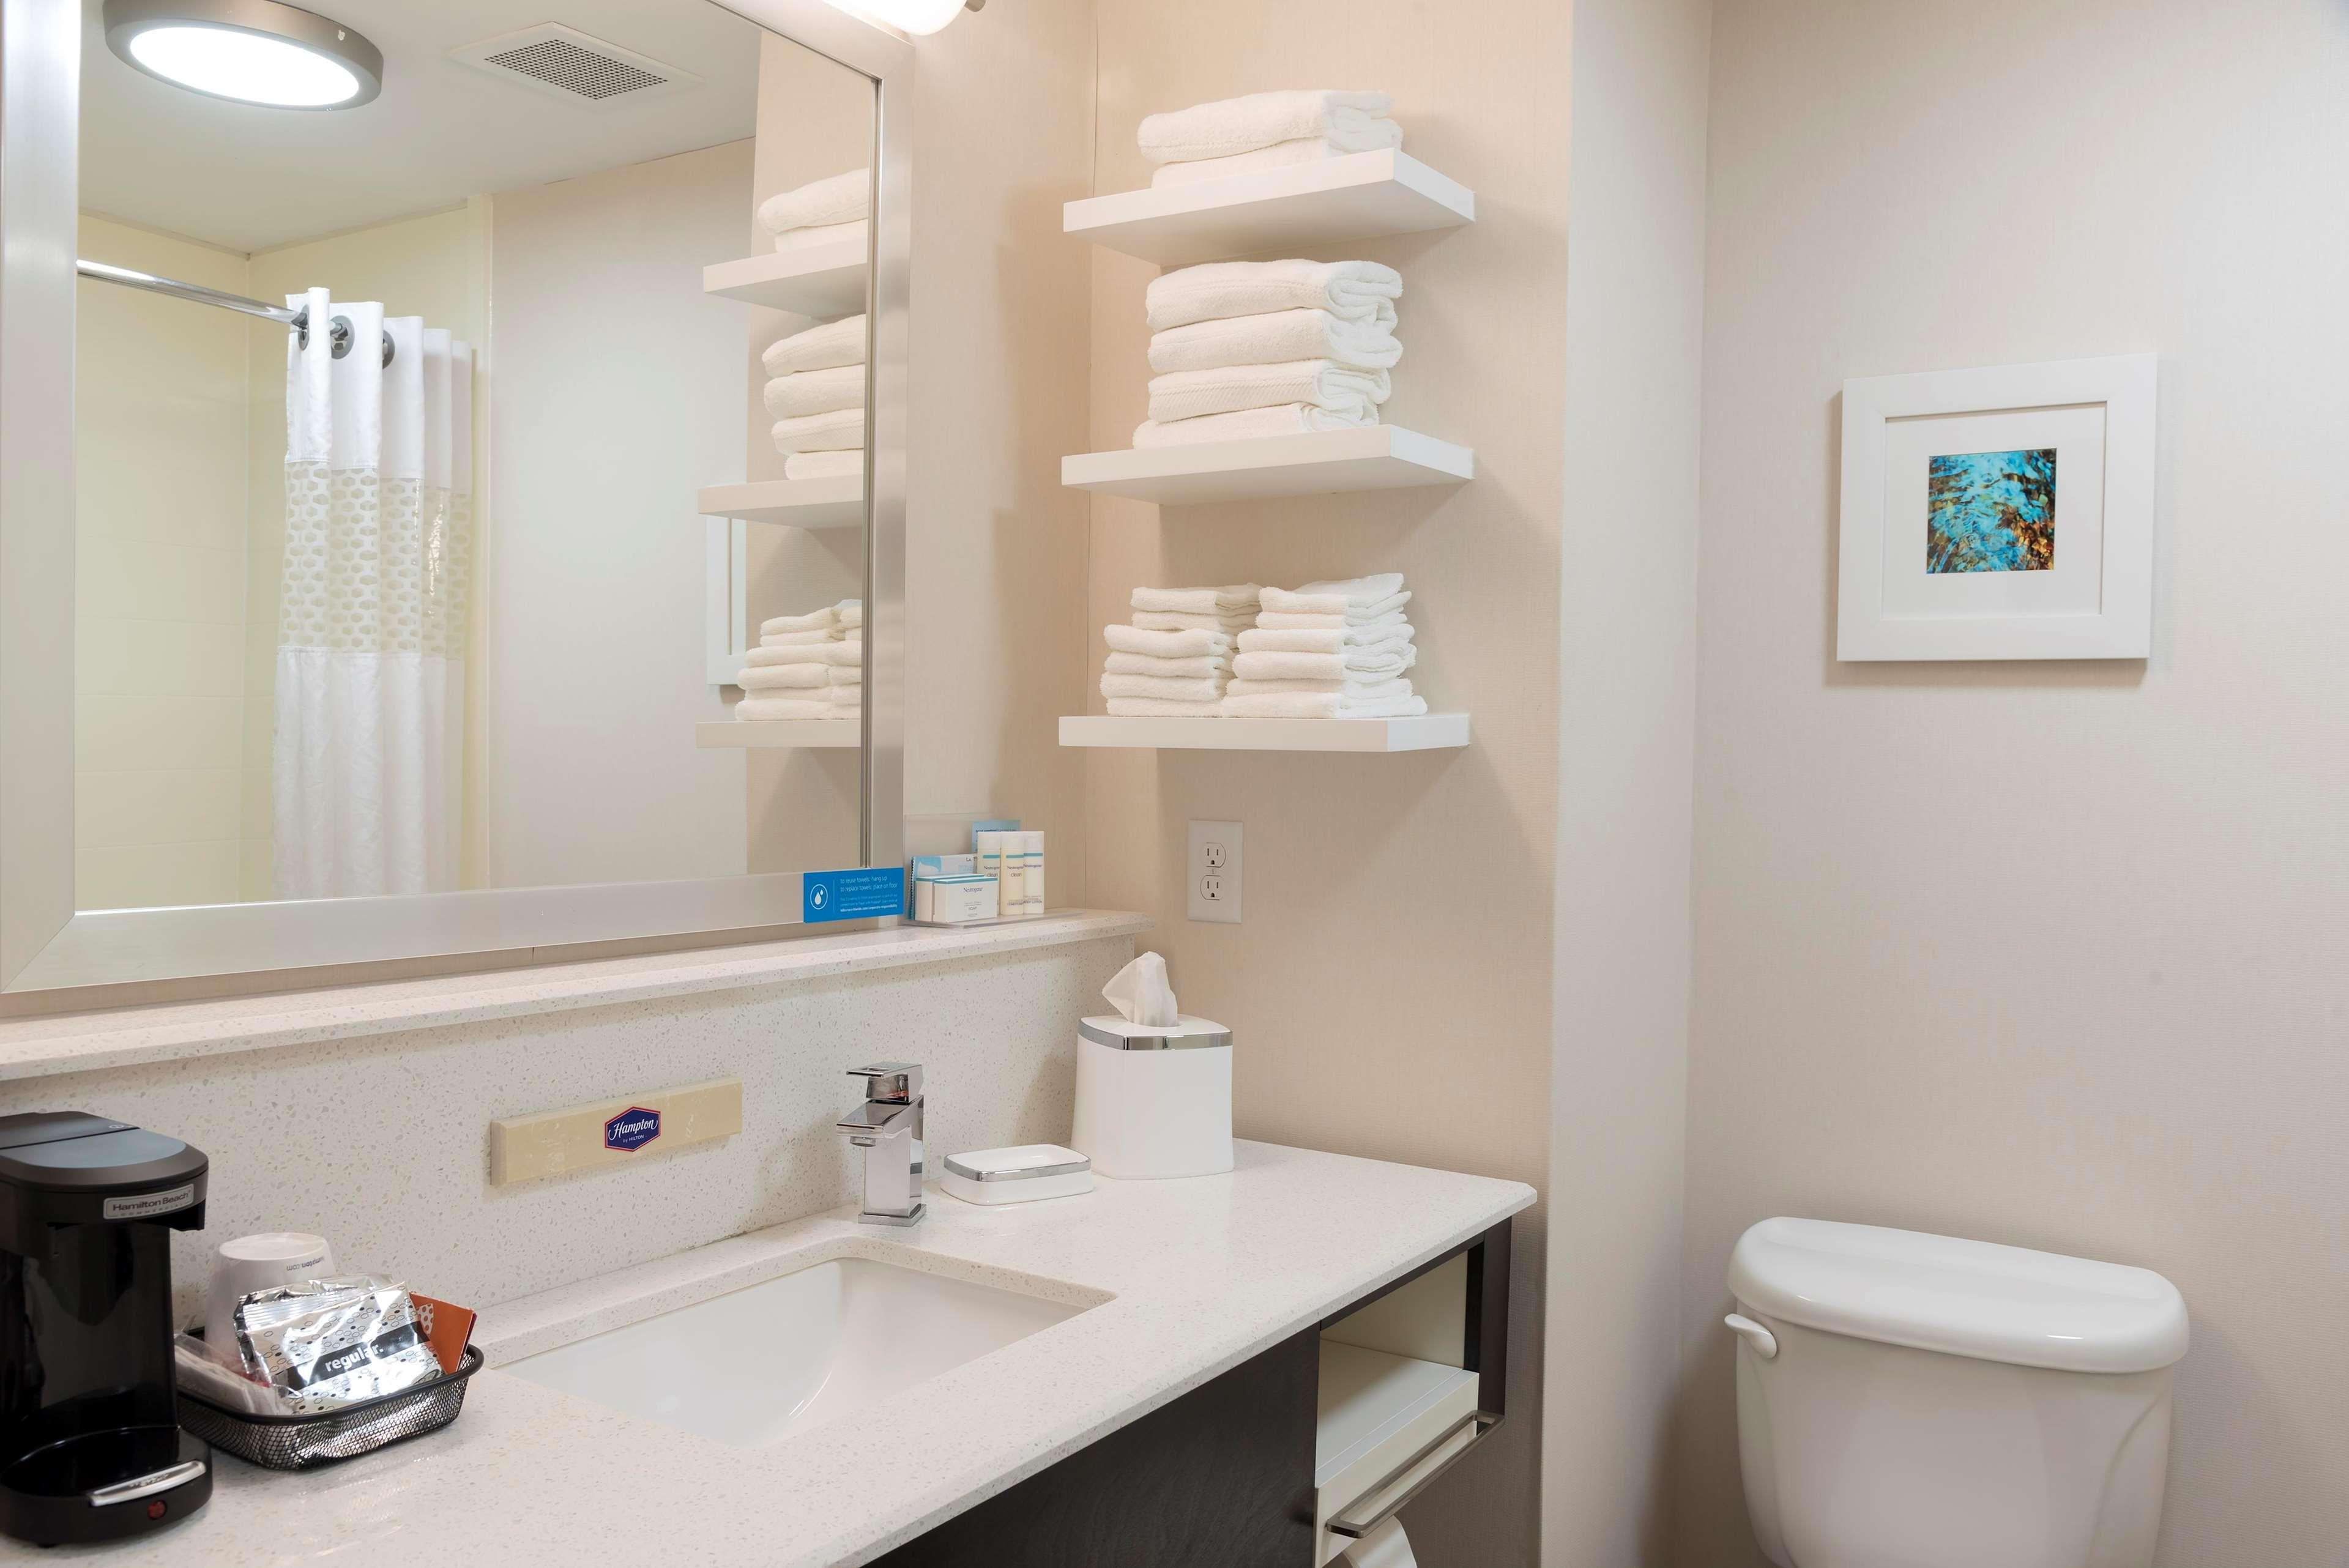 Hampton Inn & Suites Mansfield-South @ I-71 image 31